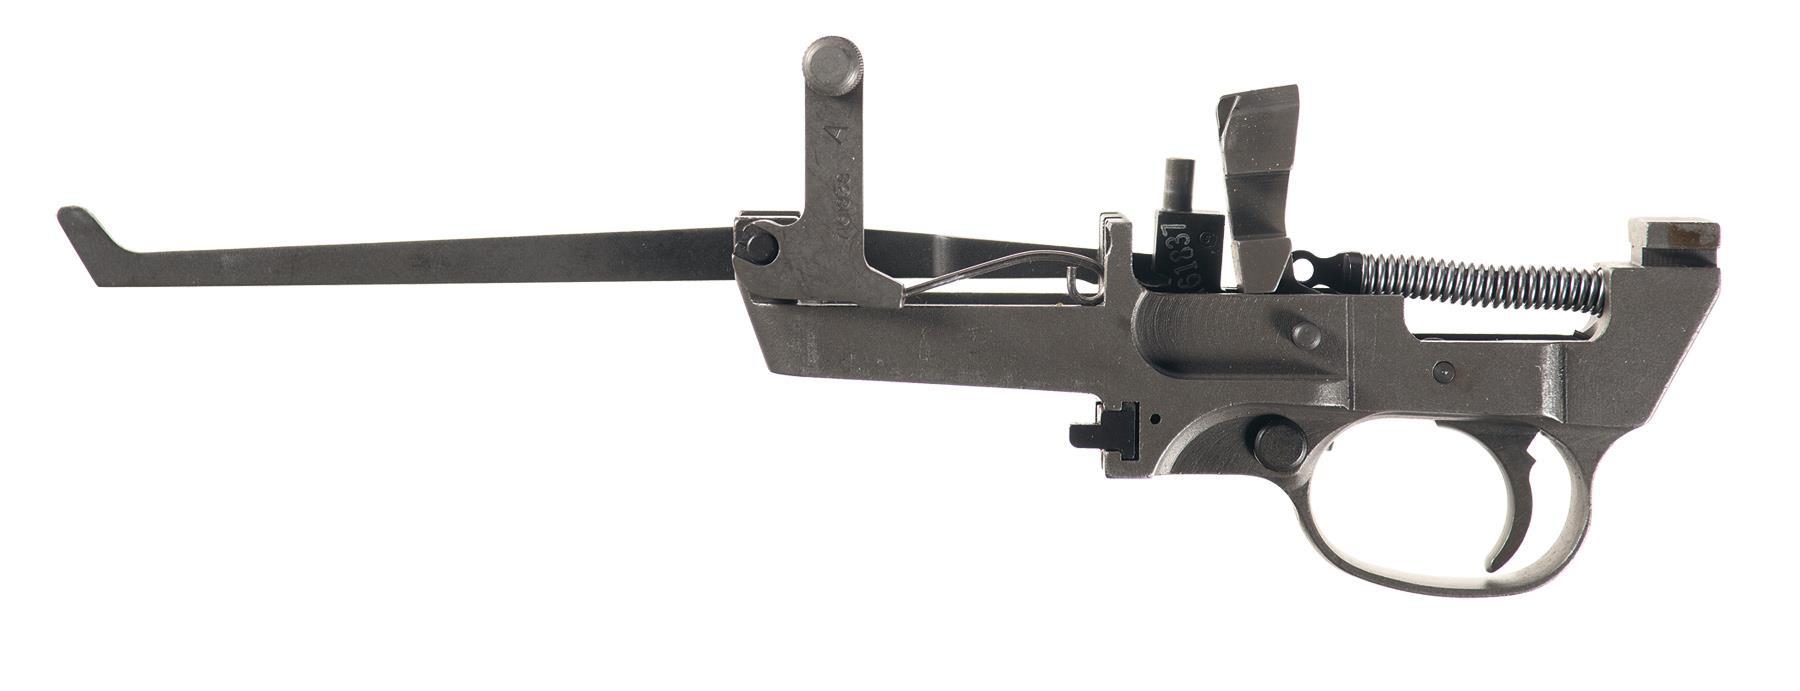 Rock Island Gun Parts